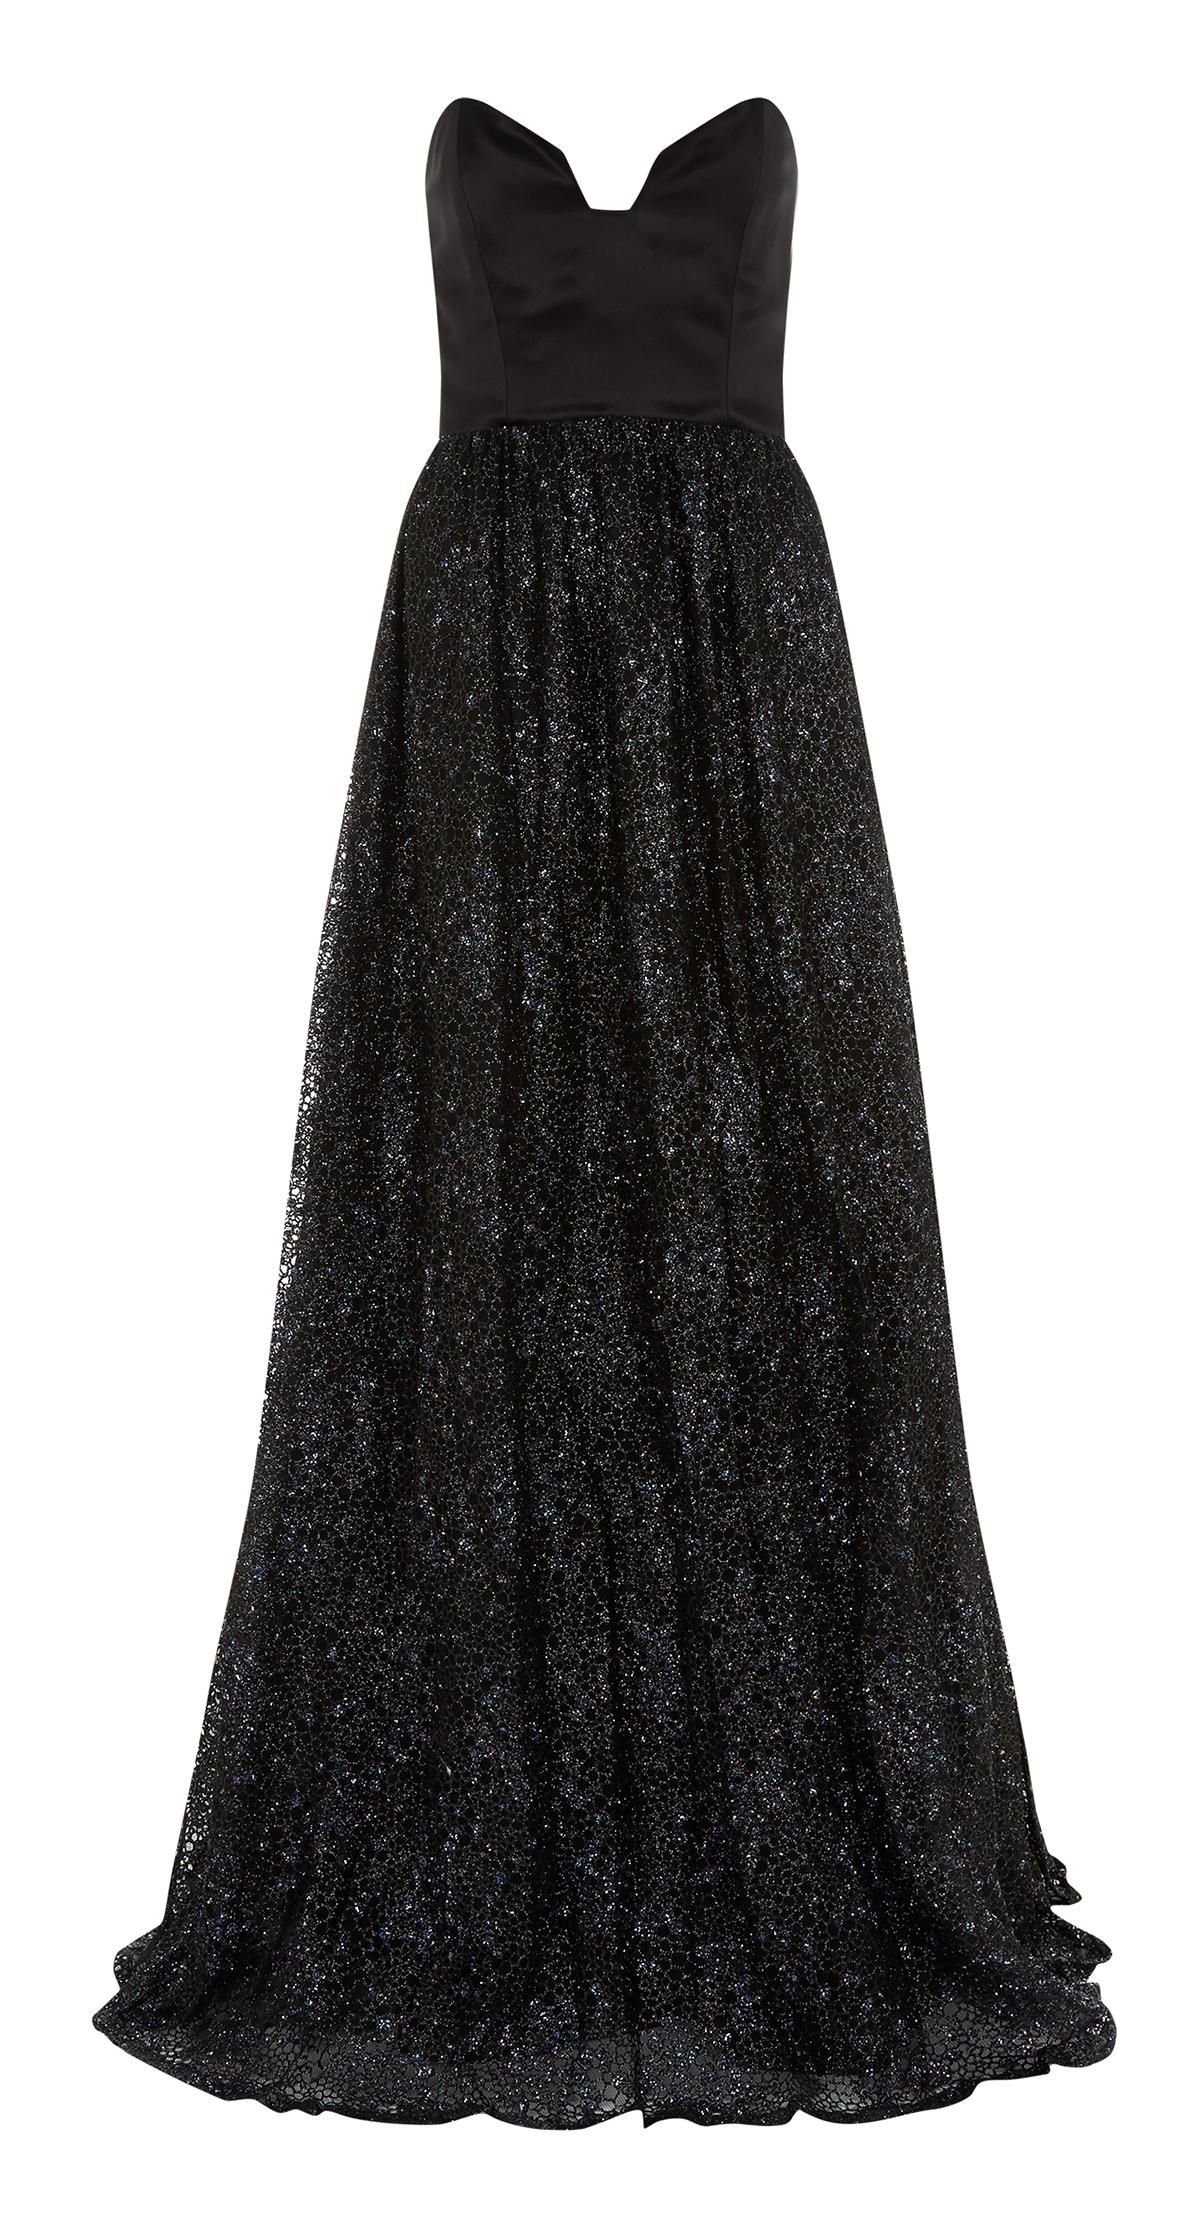 Black sparkling strapless ball gown — info@michaelafrankova.com